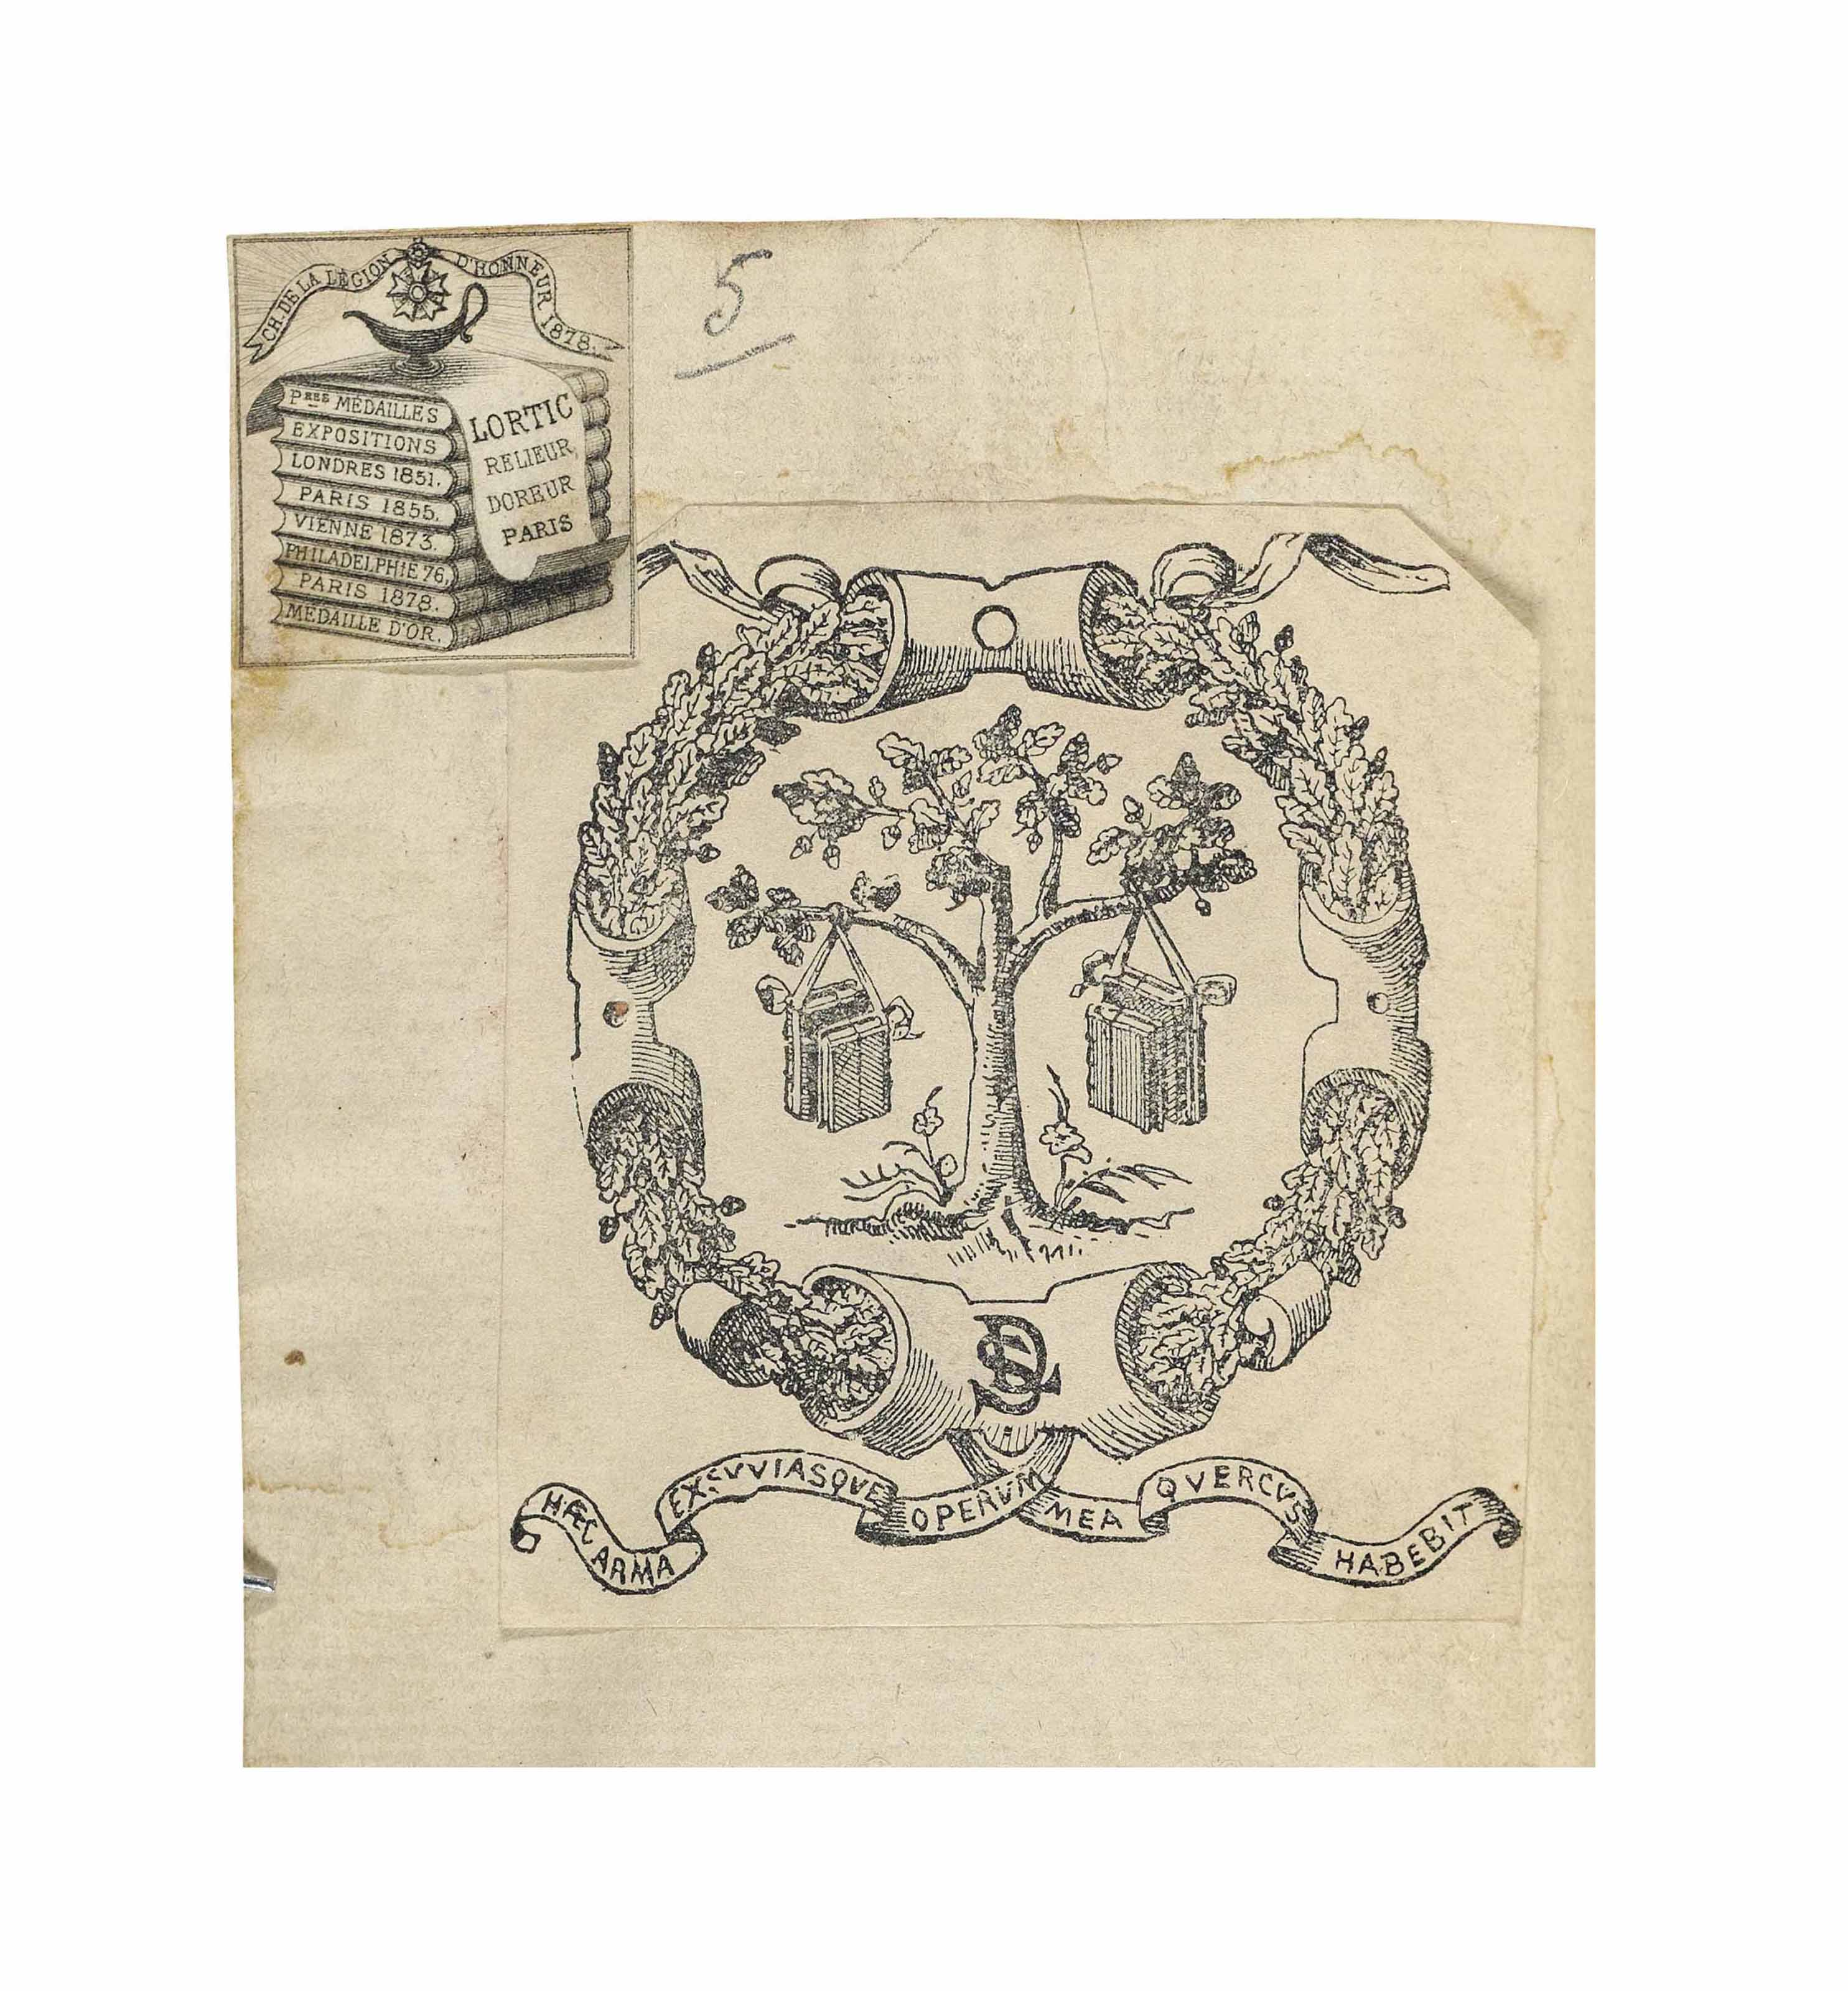 AGRIPPA, Henricus Cornelius (1